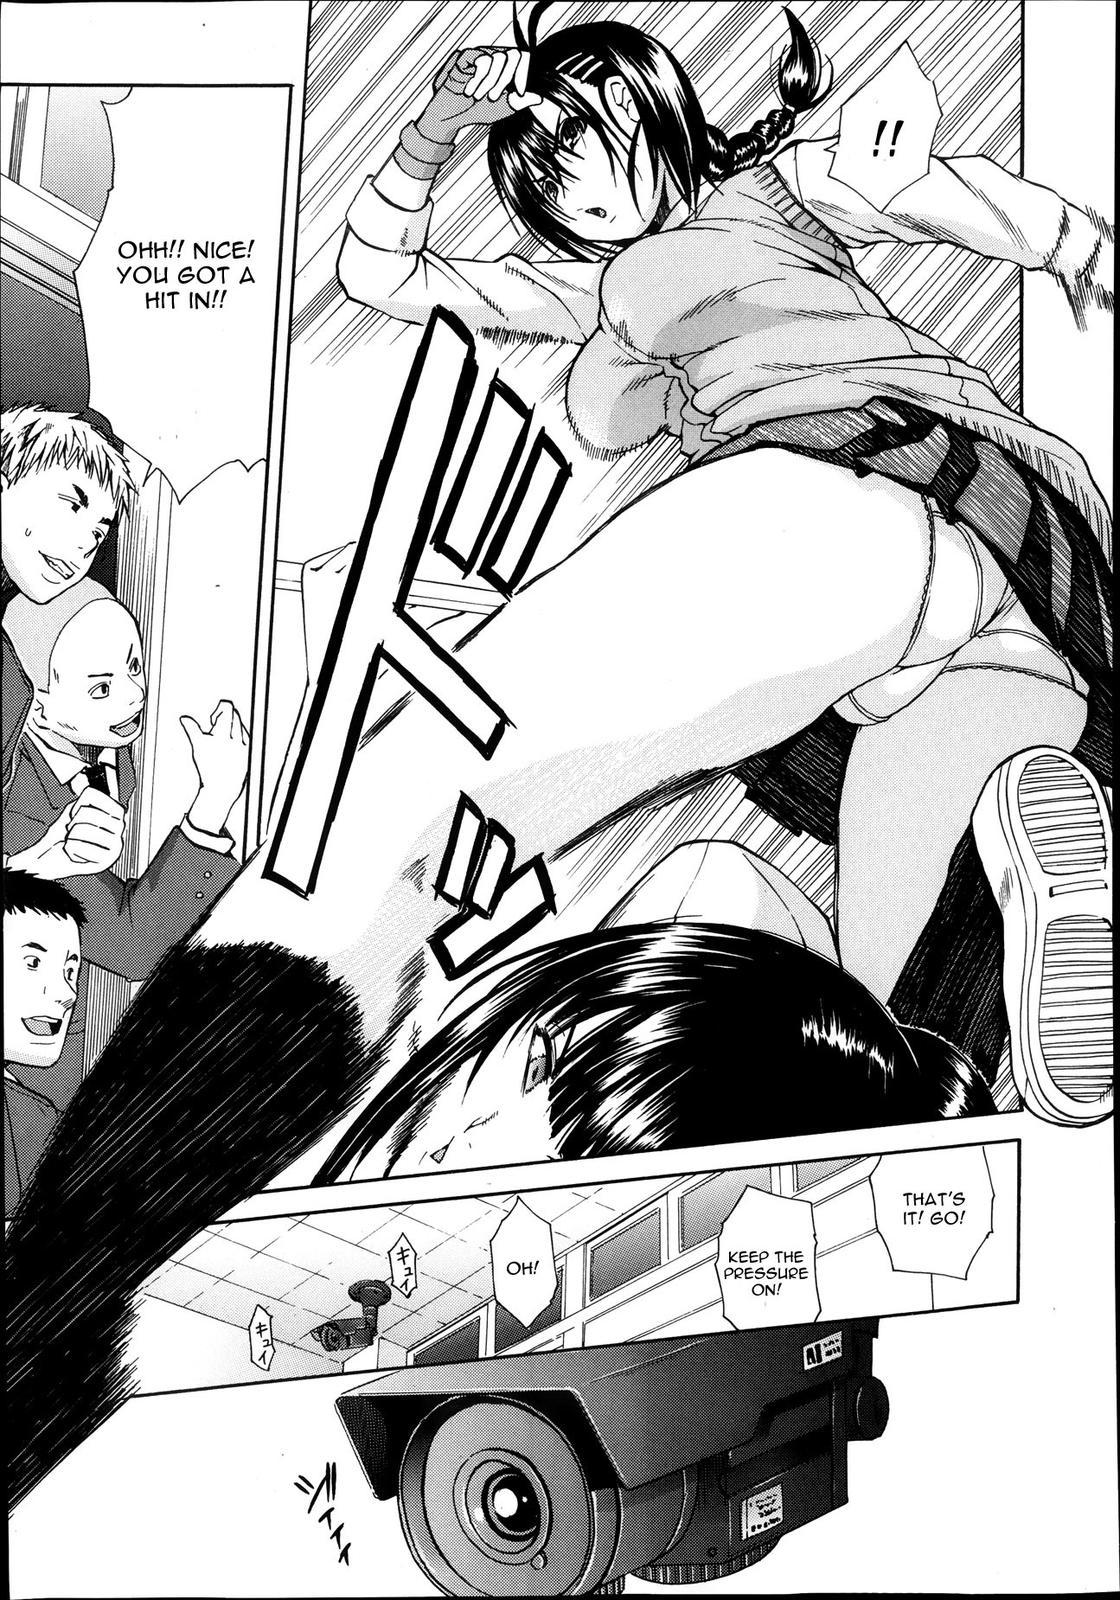 [Chiyou Yoyuchi] Rinkan Gakuen ~Haibokusha-tachi wa Midaremau~   Gang Rape School: The Losers Dance Indecently [English] 41